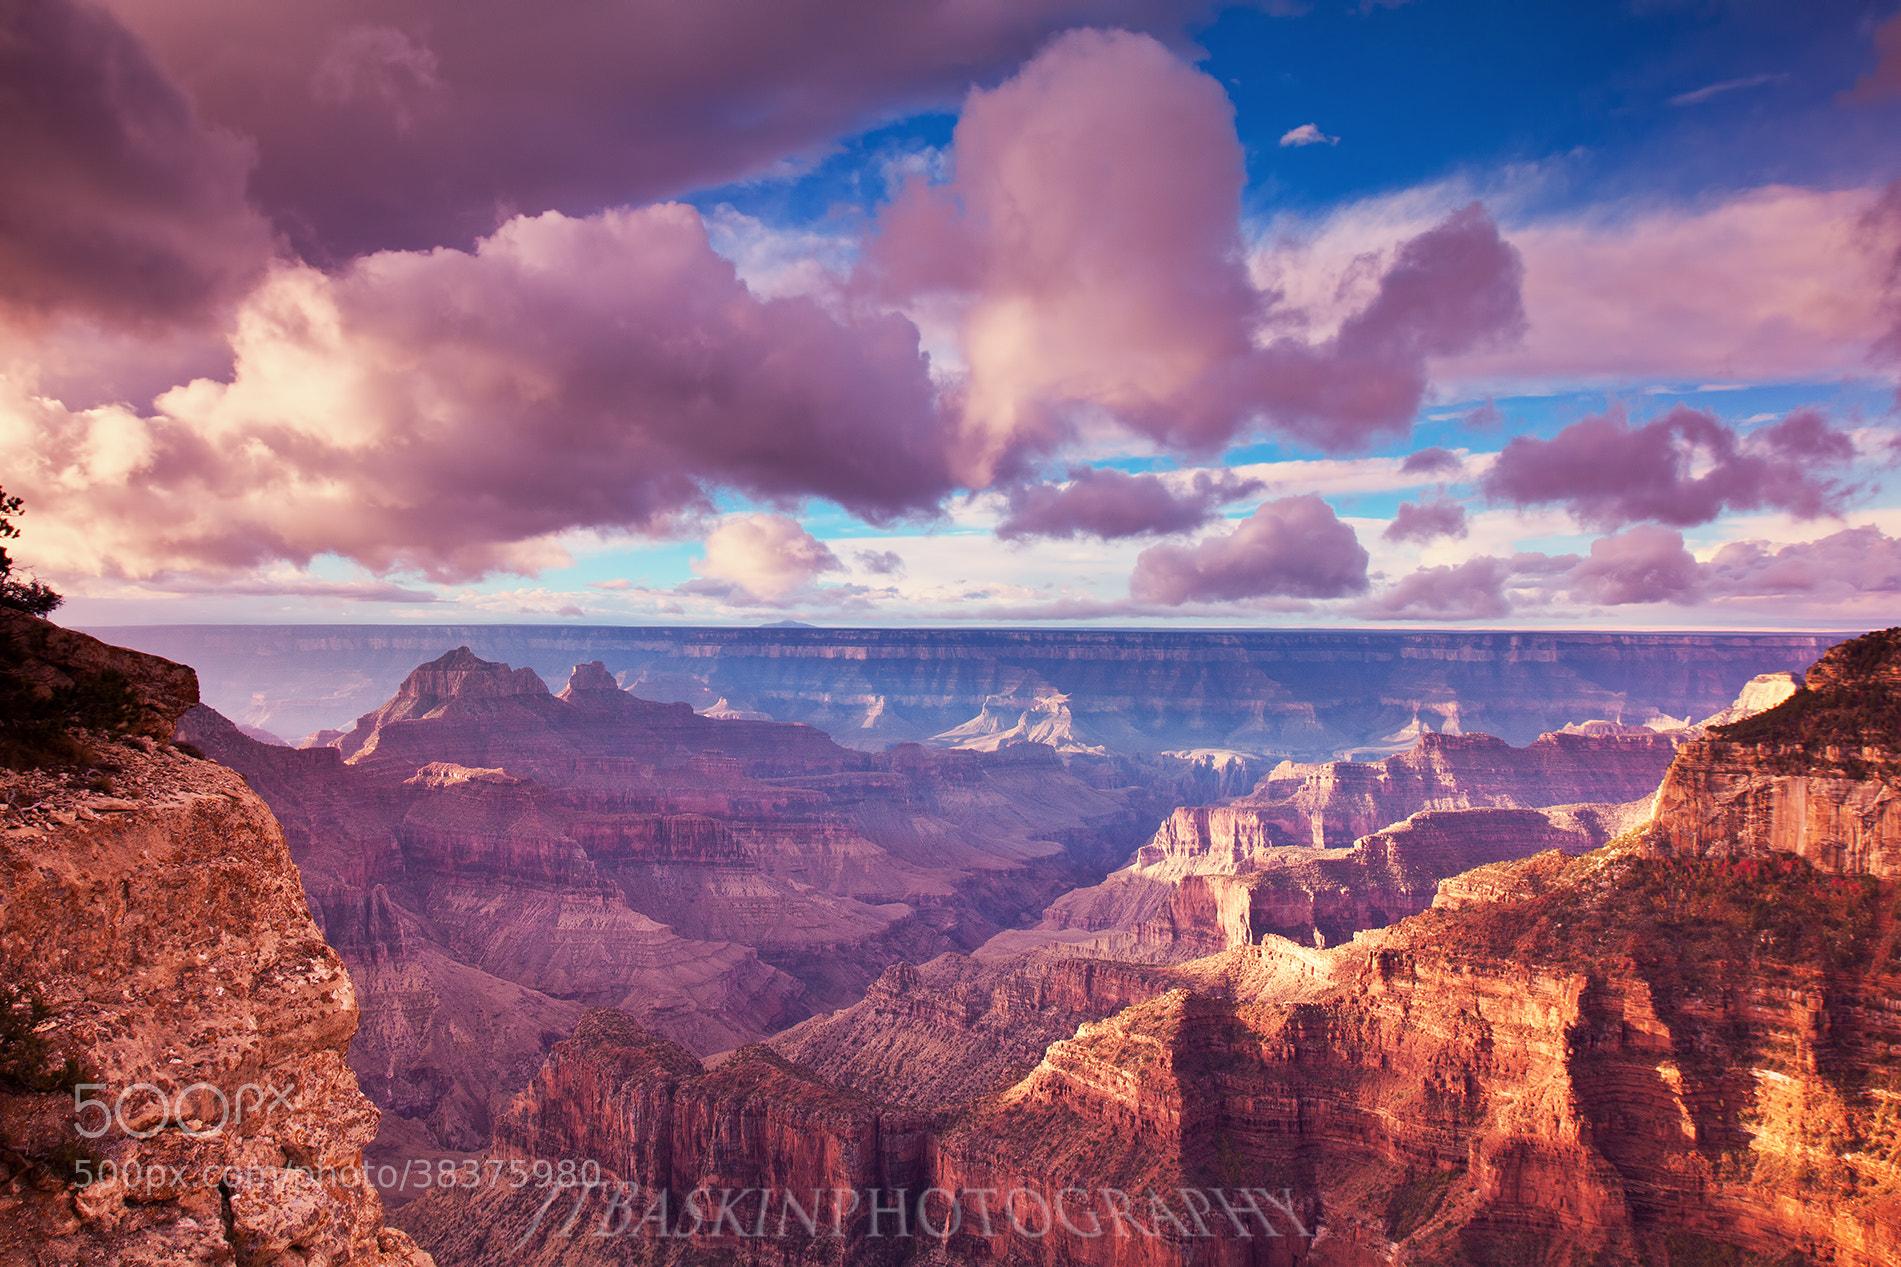 Photograph Grand Canyon Glory - Grand Canyon National Park, AZ by taylor baskin on 500px